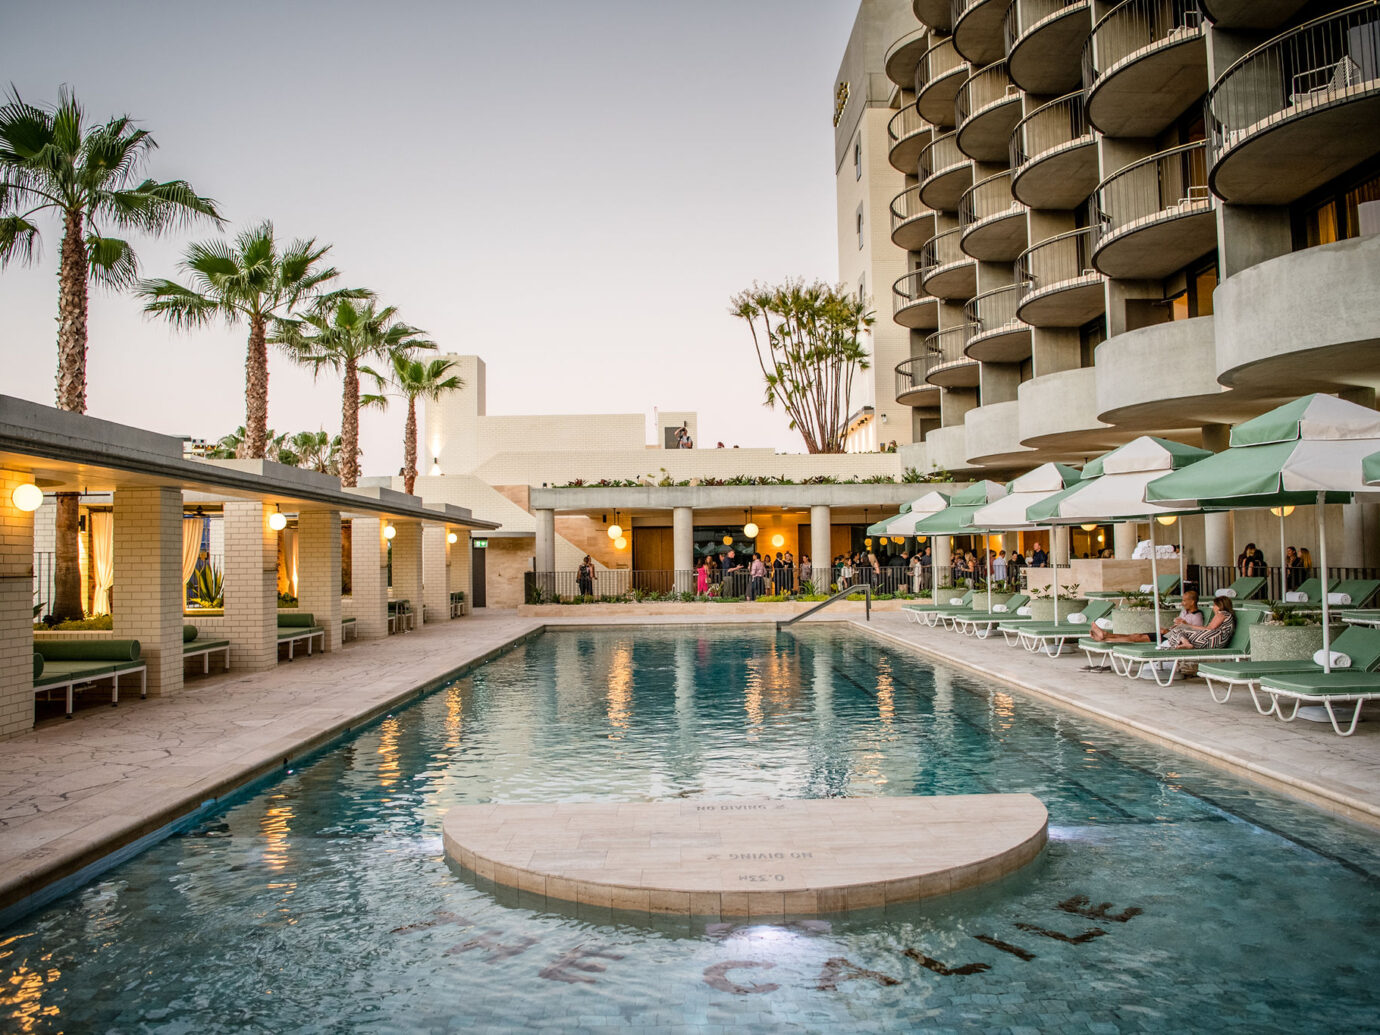 Pool at Calile Hotel